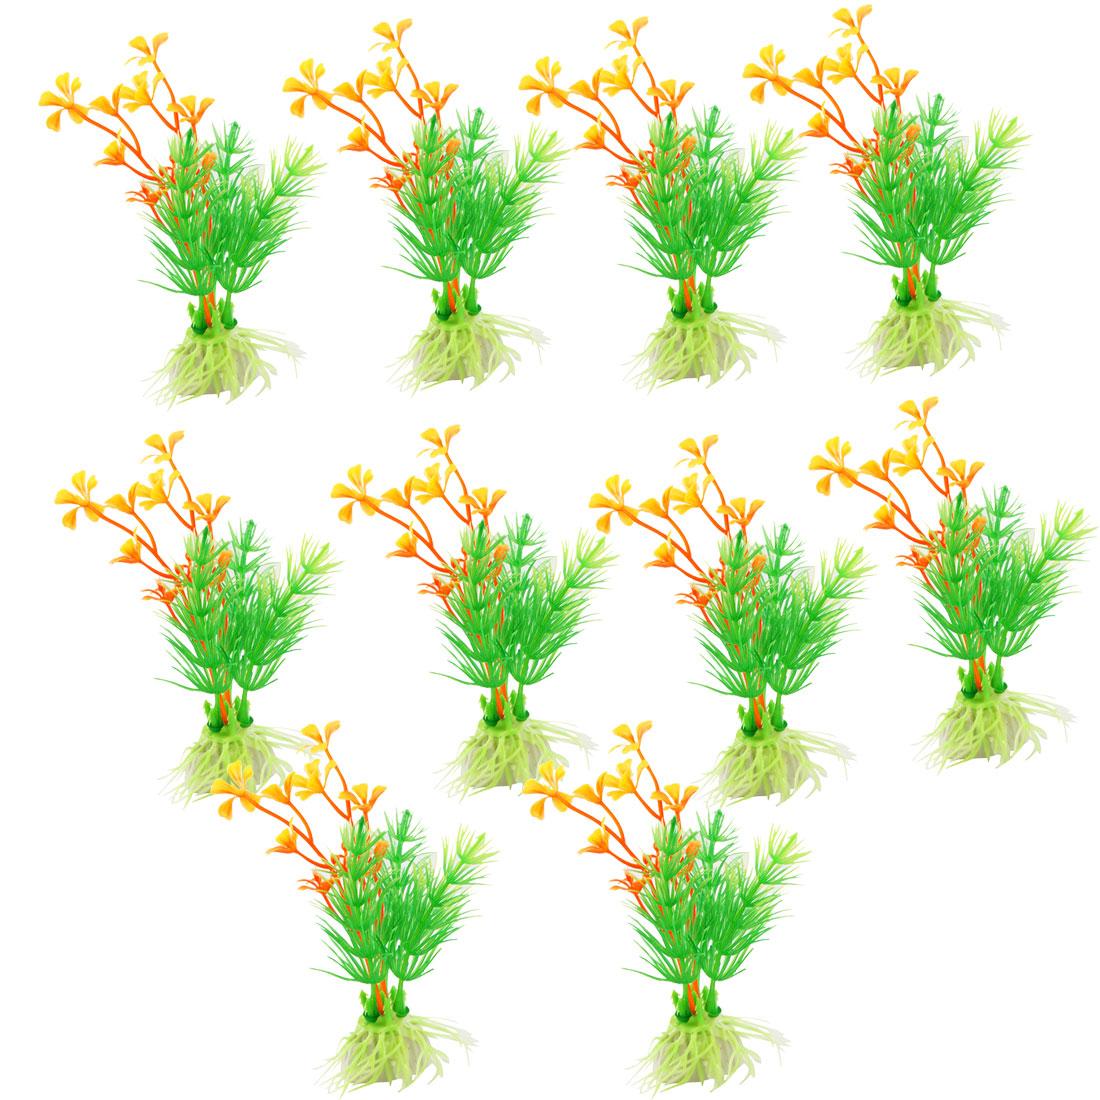 "10 Pcs 4.5"" Height Plastic Grass Plant Green Orange Yellow for Fish Tank Decor"